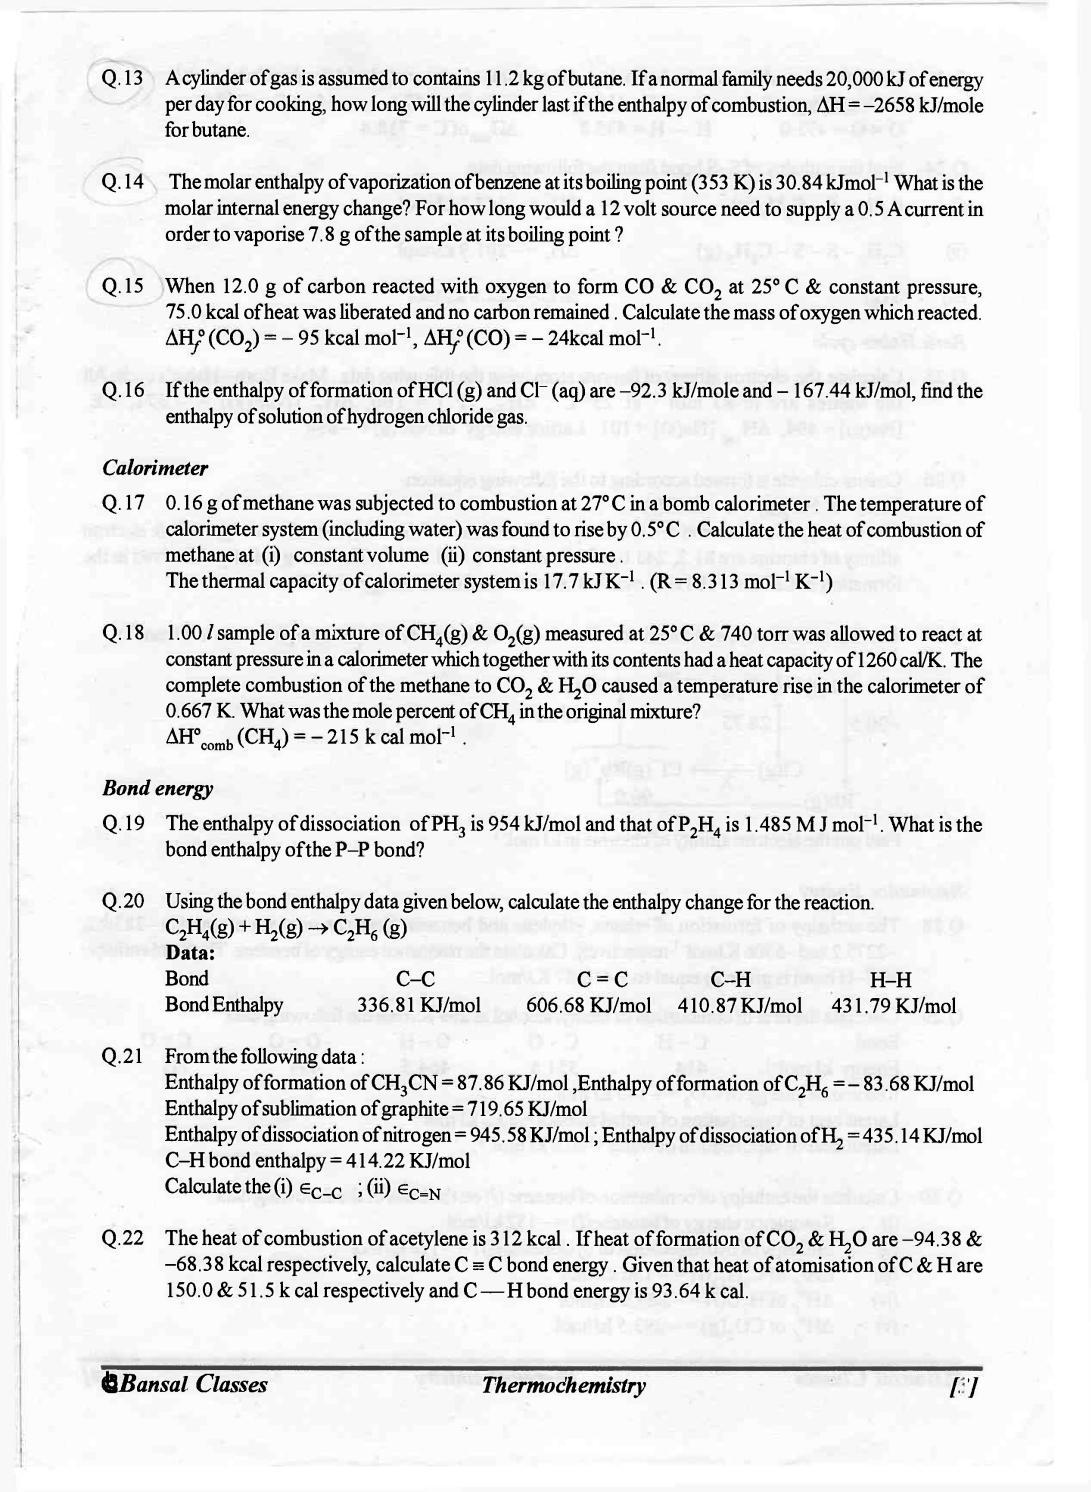 Bond Energy Of Hcl - Energy Etfs